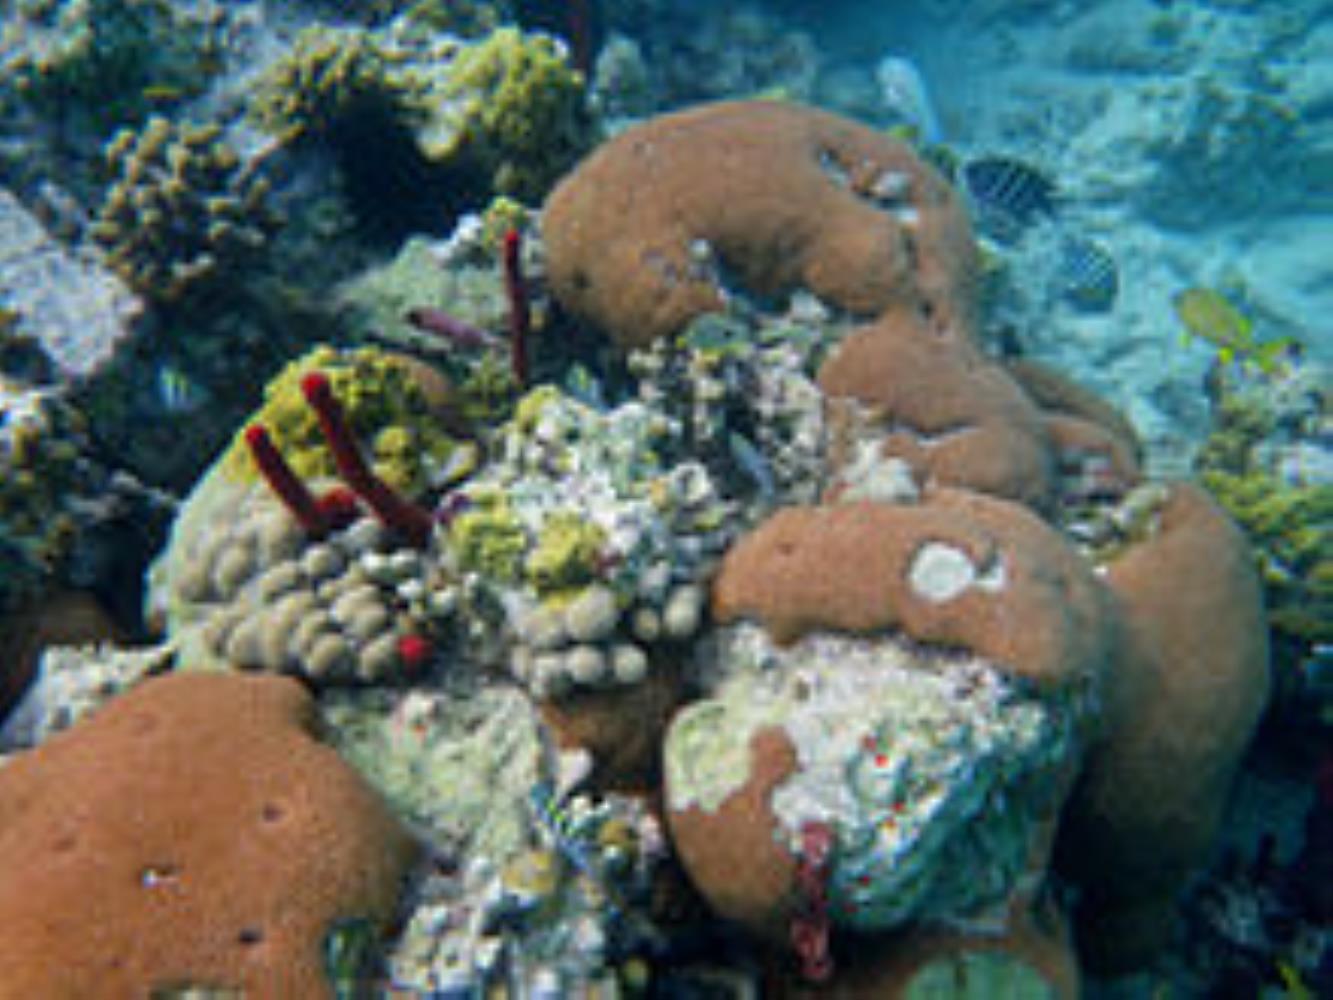 Massive Starlet Coral